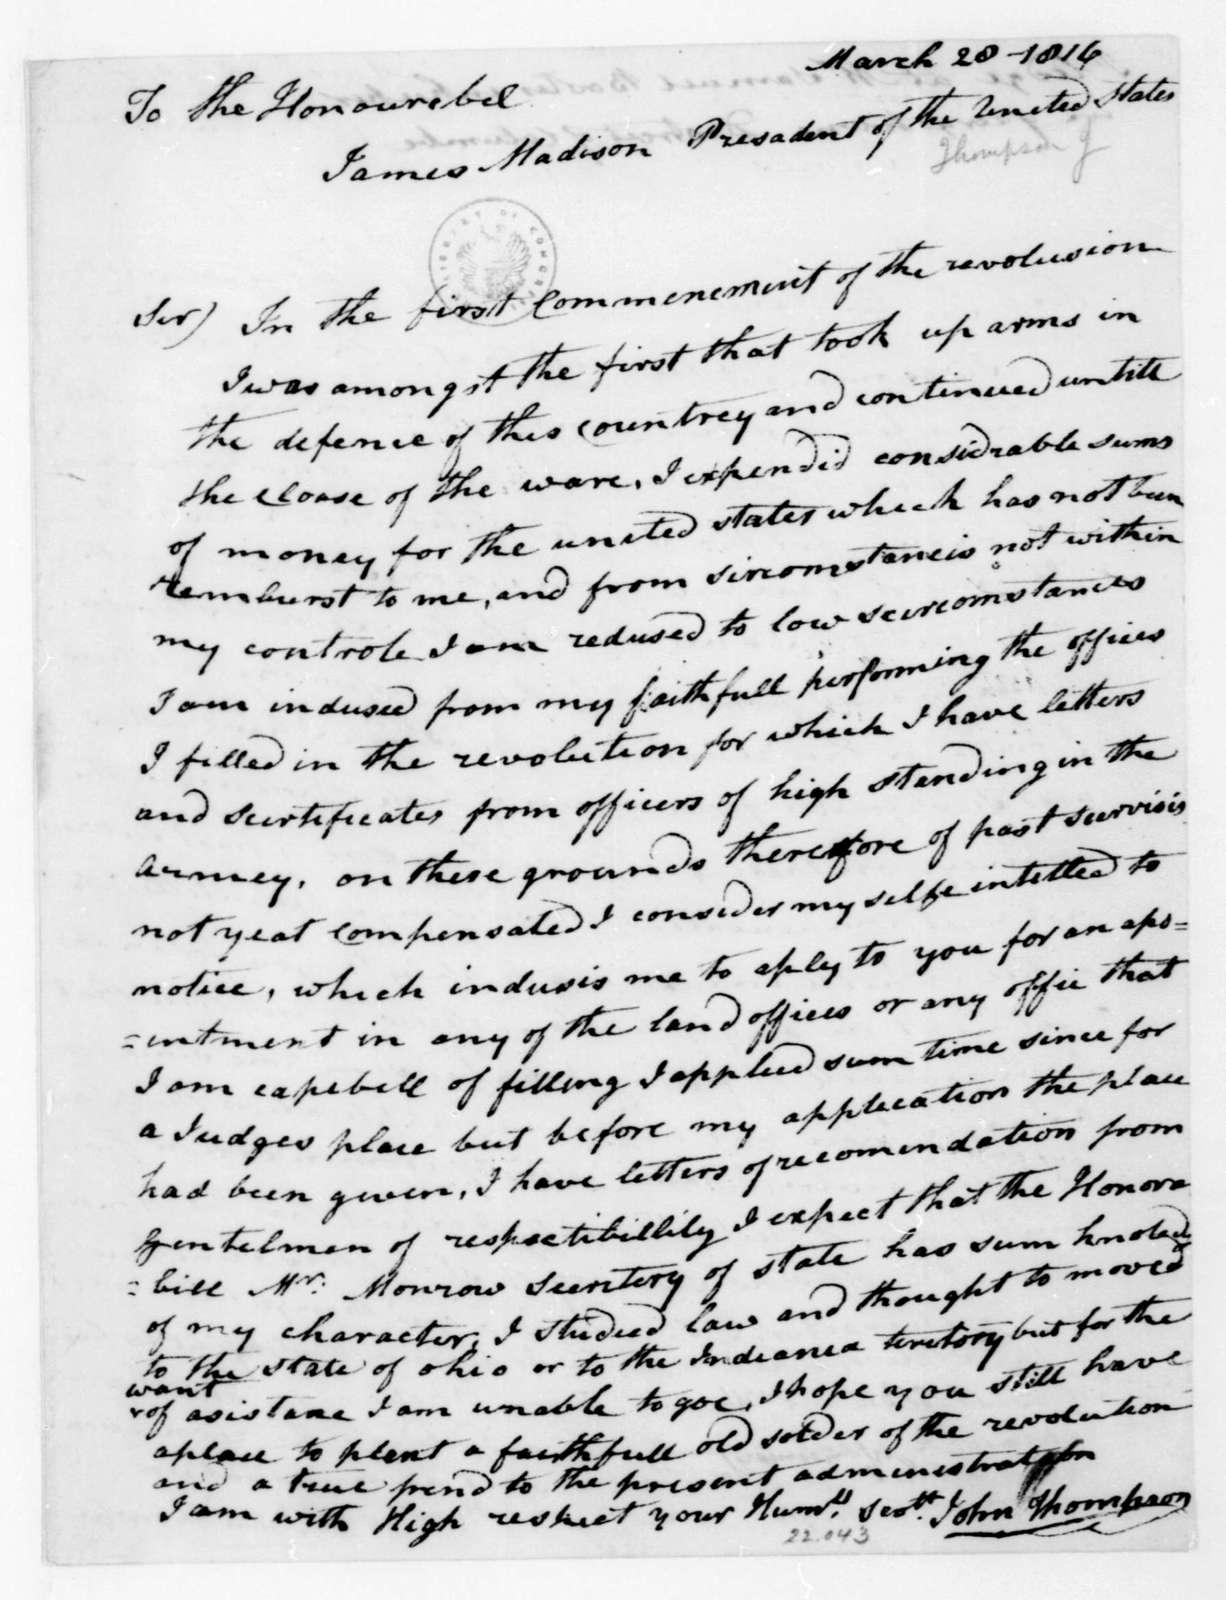 John Thompson to James Madison, March 28, 1816.